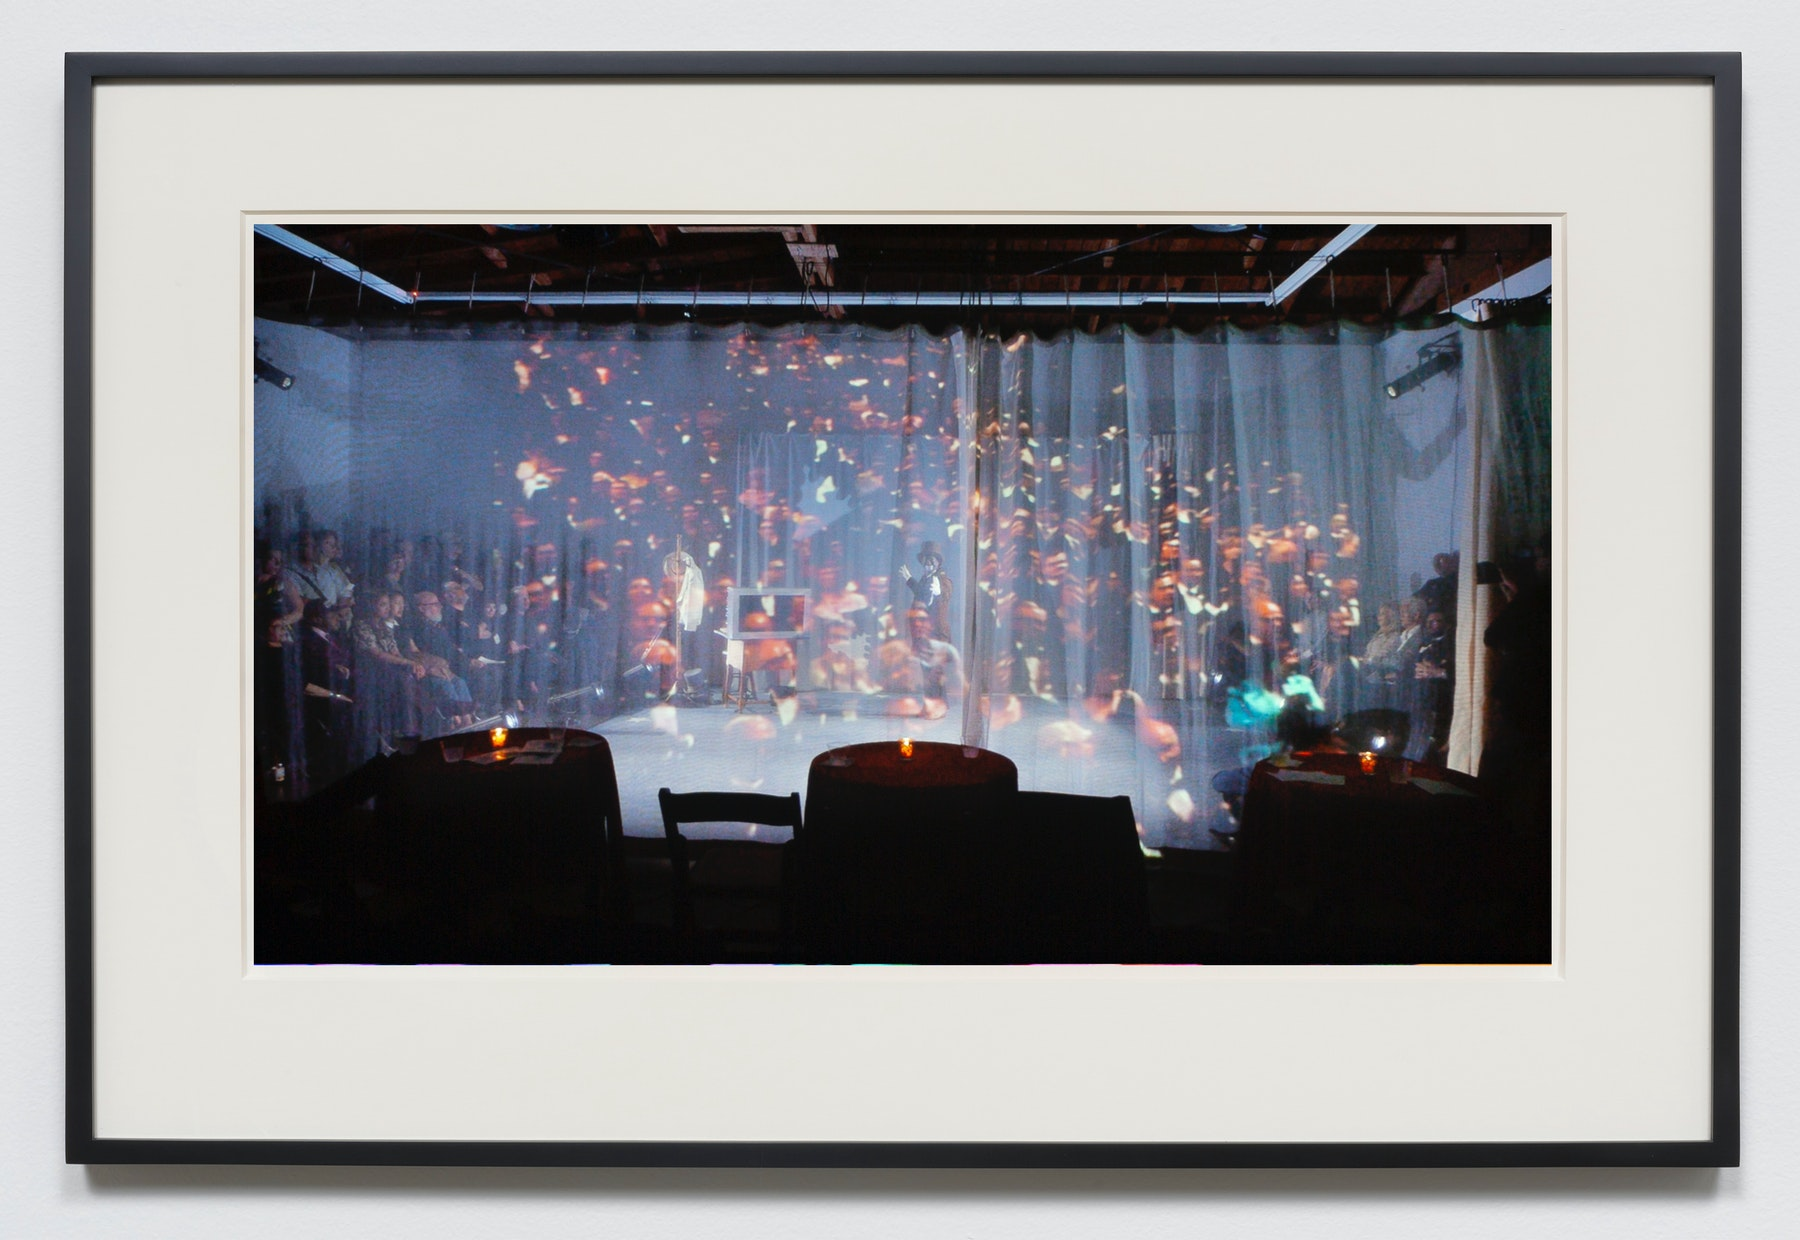 "Edgar Arceneaux ""These My Friends,"" 2015-2020 Photographic print 20 x 36"" [HxW] (50.8 x 91.44 cm) unframed, 23.5 x 39.5 x 2"" [HxWxD] (59.69 x 100.33 x 5.08 cm) framed Edition 1 of 5, 2 AP Inventory #ARC625.01 Courtesy of the artist and Vielmetter Los Angeles"